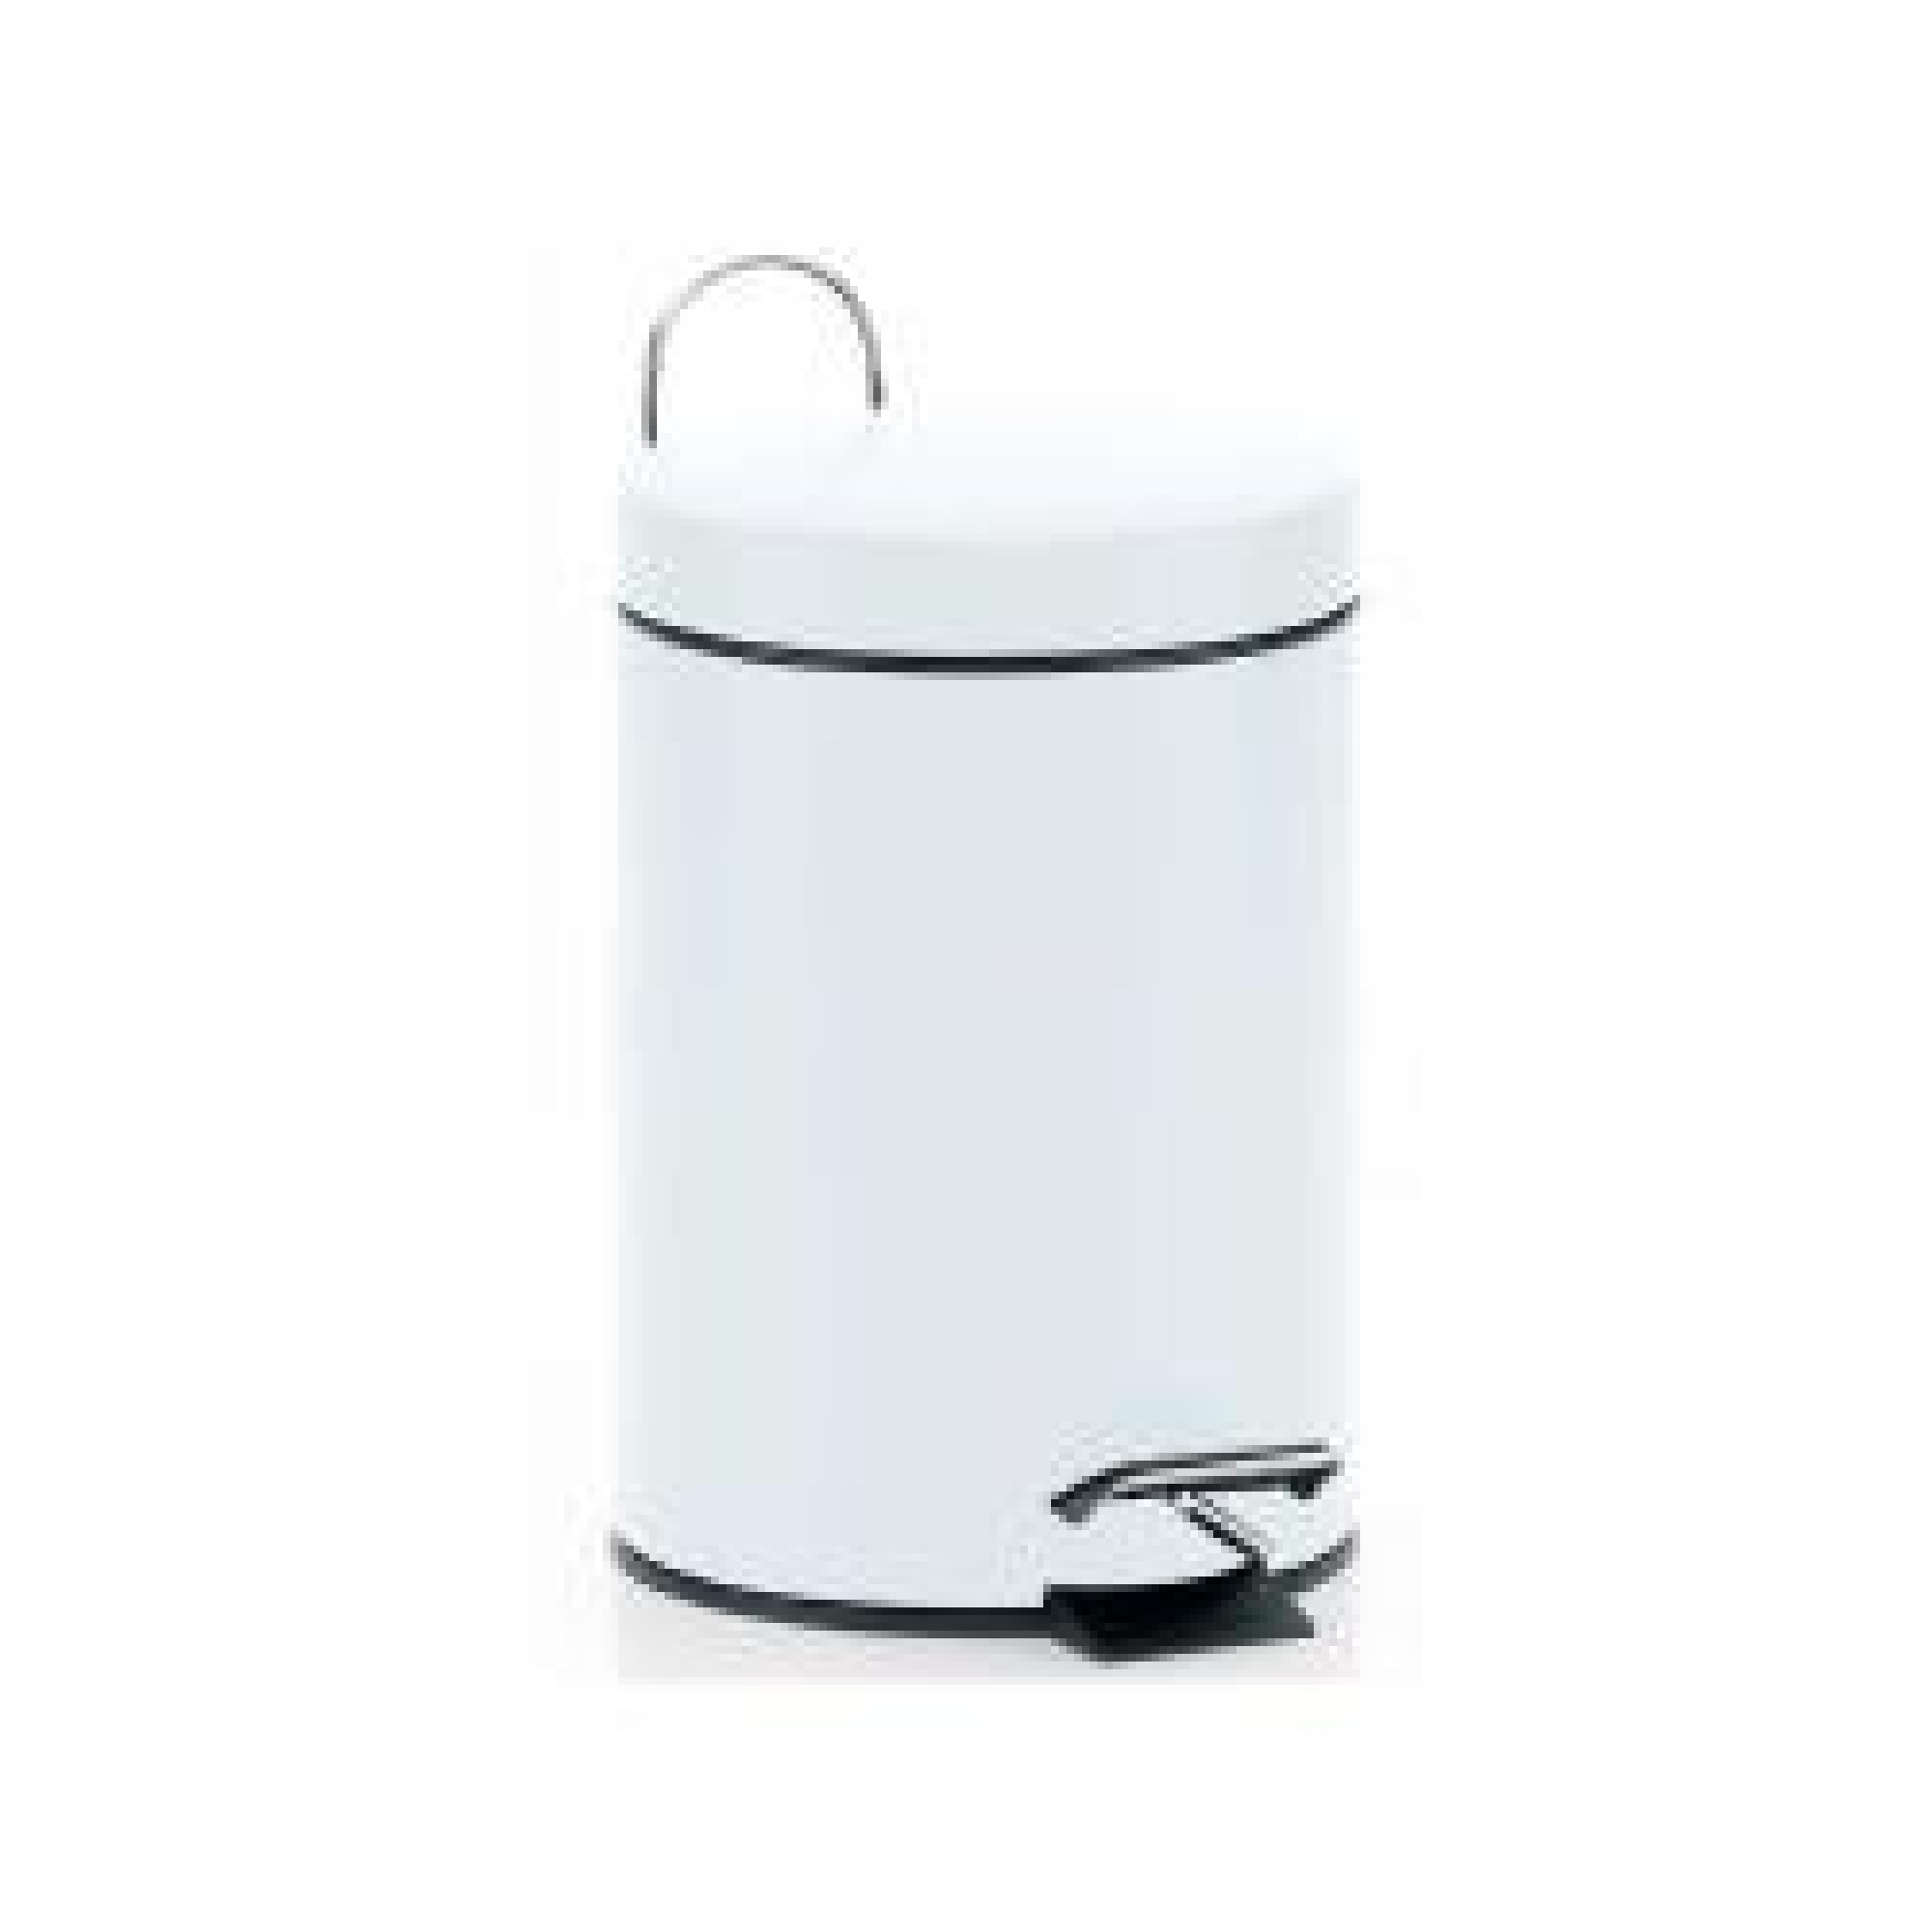 Vorgod cubo de basura pedal for Cubo basura extraible ikea